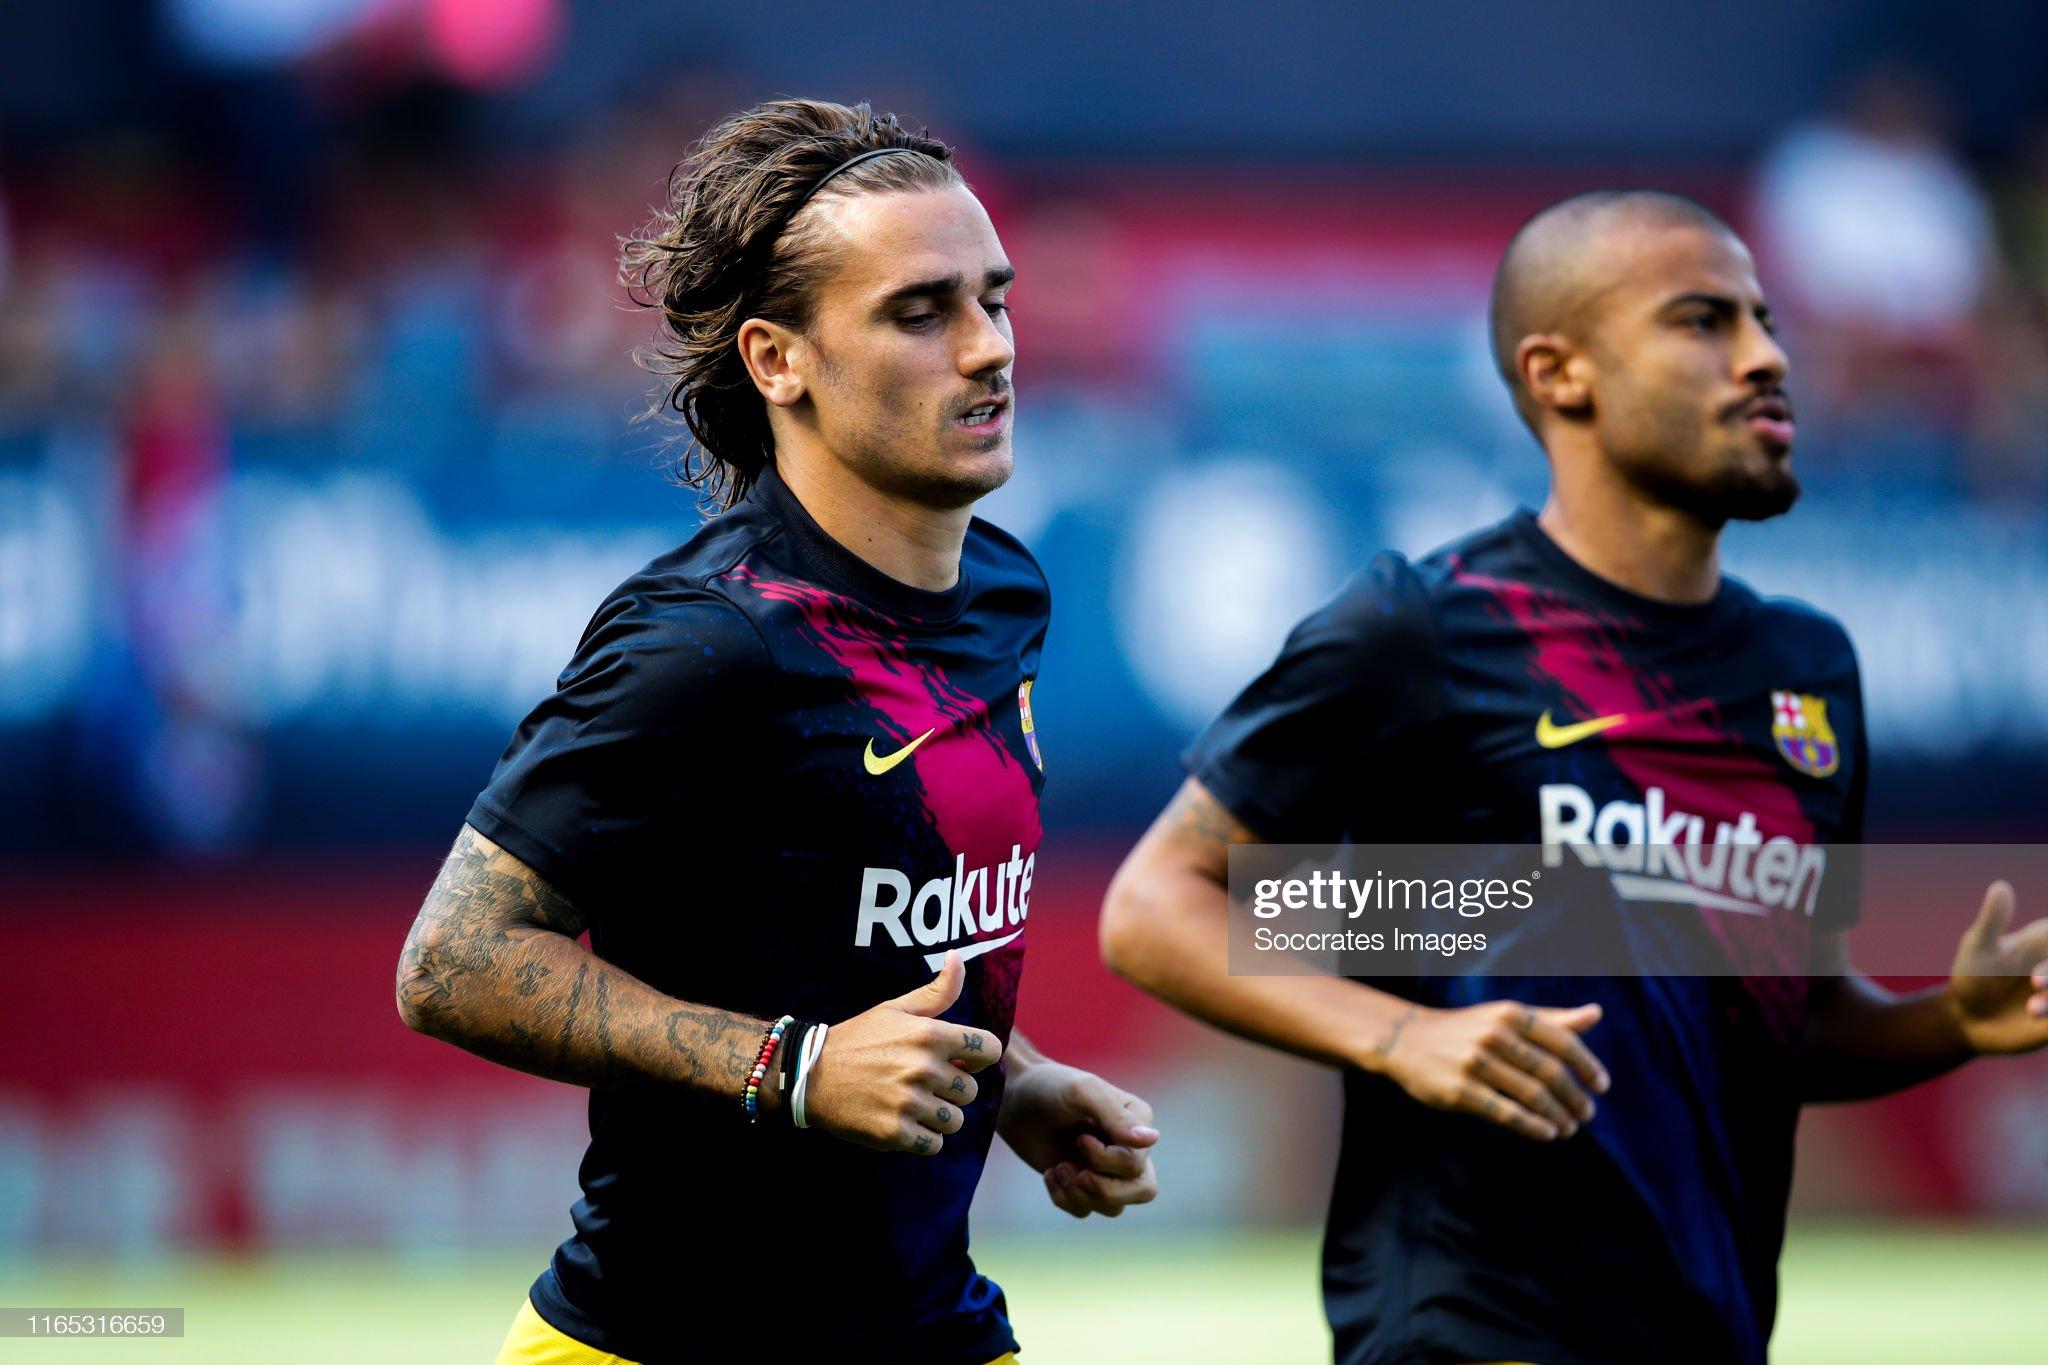 صور مباراة : أوساسونا - برشلونة 2-2 ( 31-08-2019 )  Antoine-griezmann-of-fc-barcelona-rafinha-of-fc-barcelona-during-the-picture-id1165316659?s=2048x2048